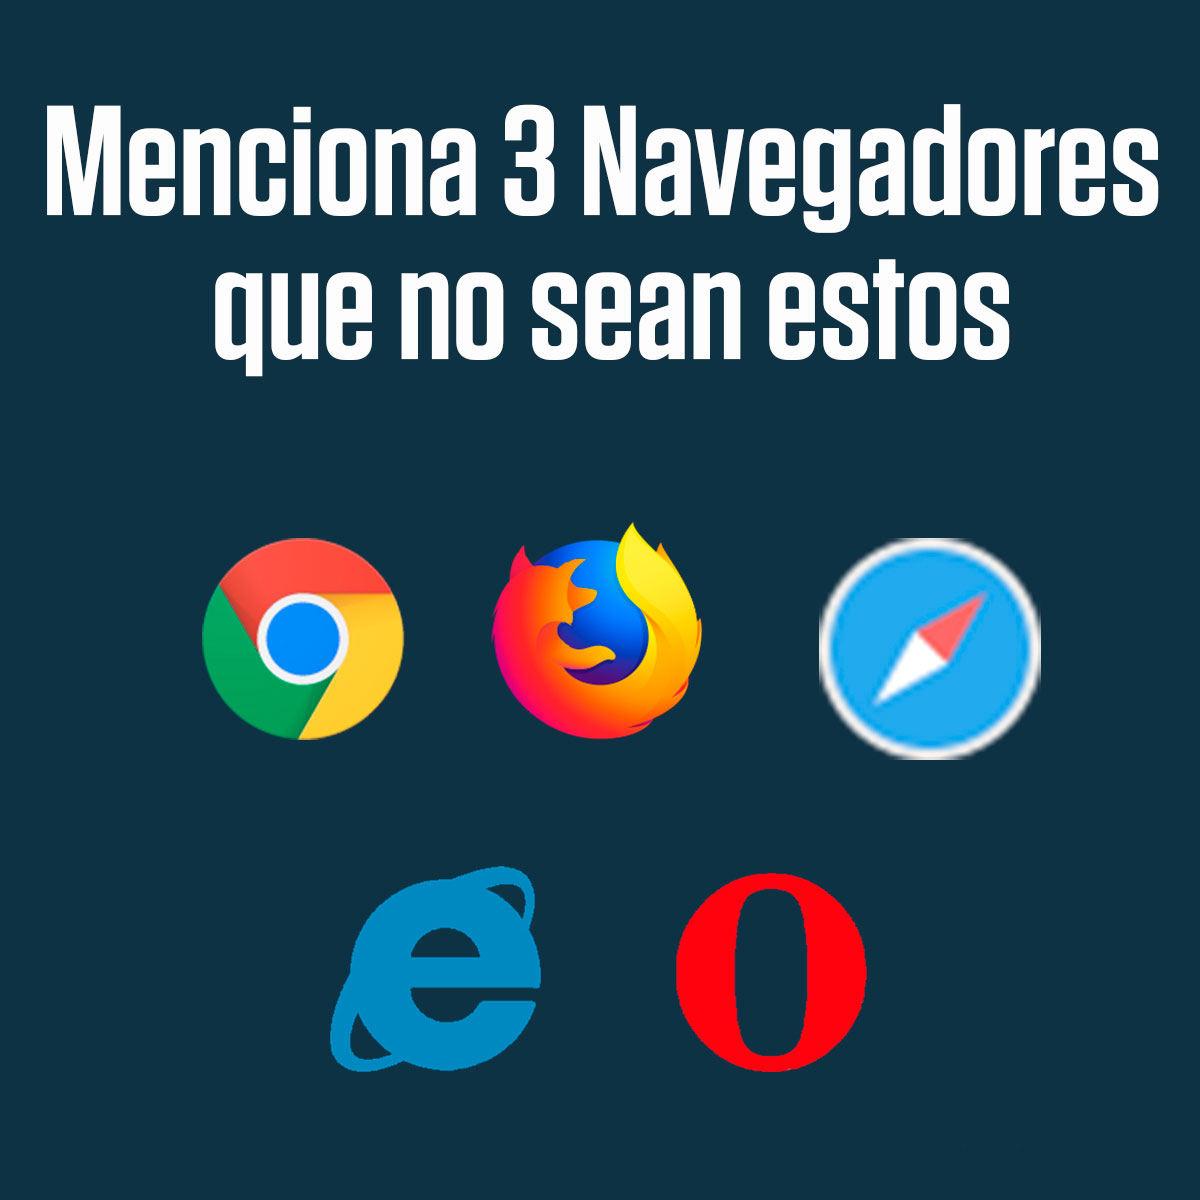 menciona 3 navegadores